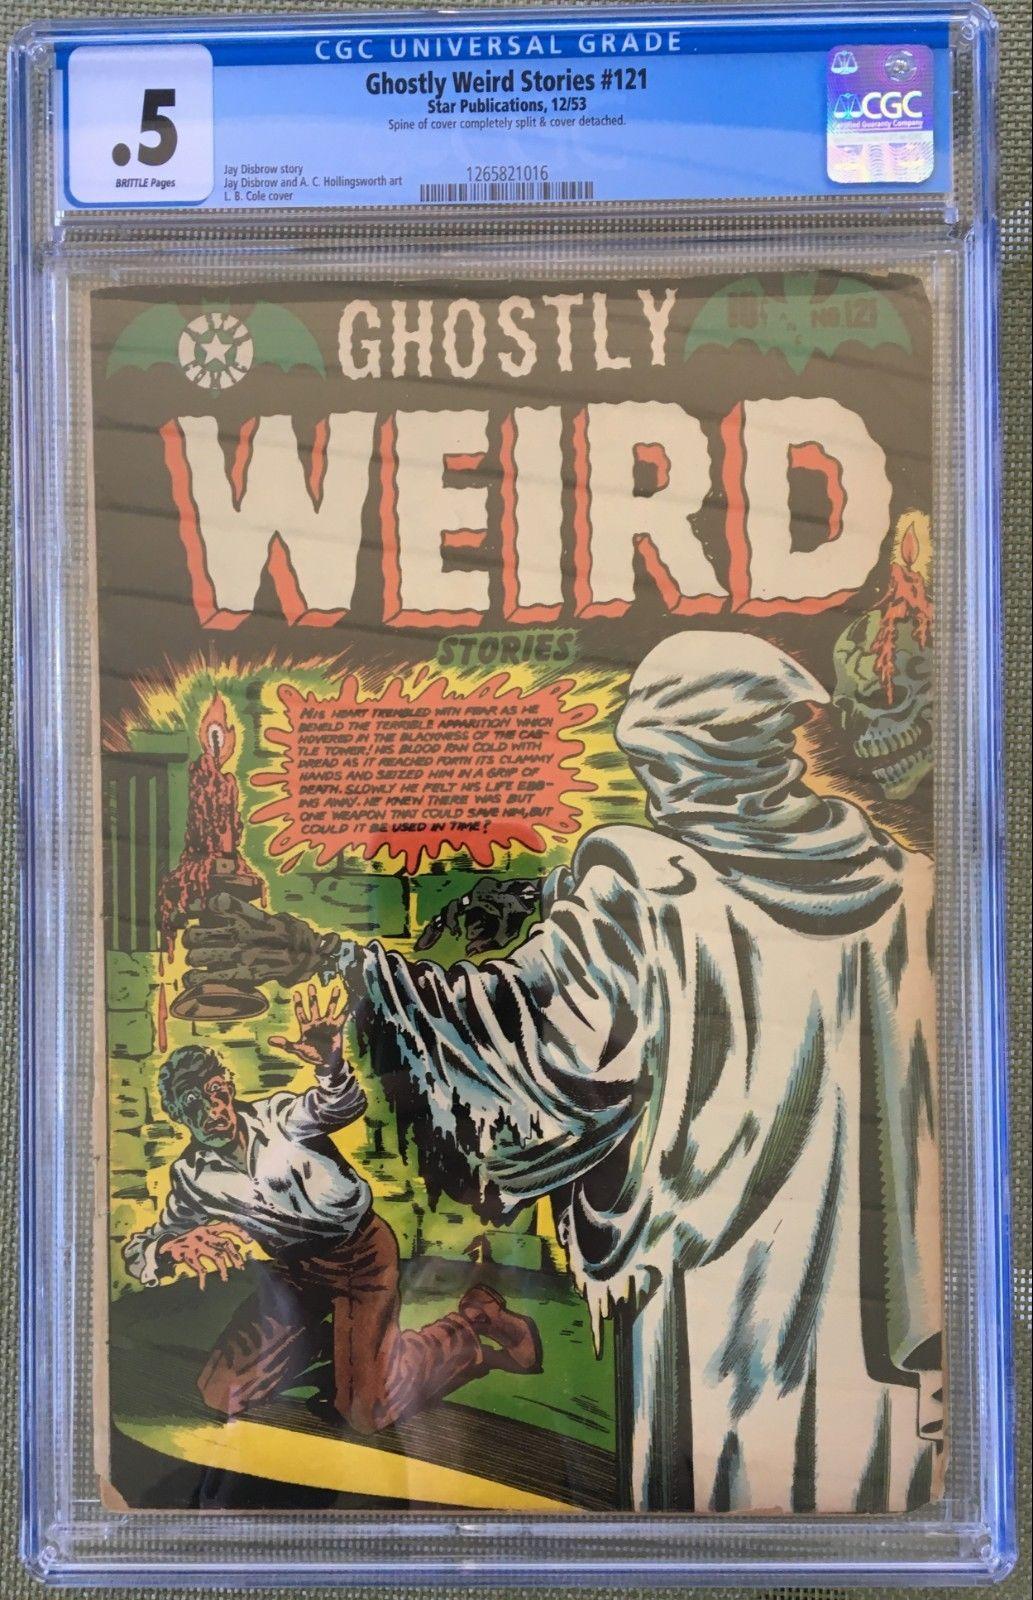 Ghostly Weird Stories #121 CGC 0.5 b